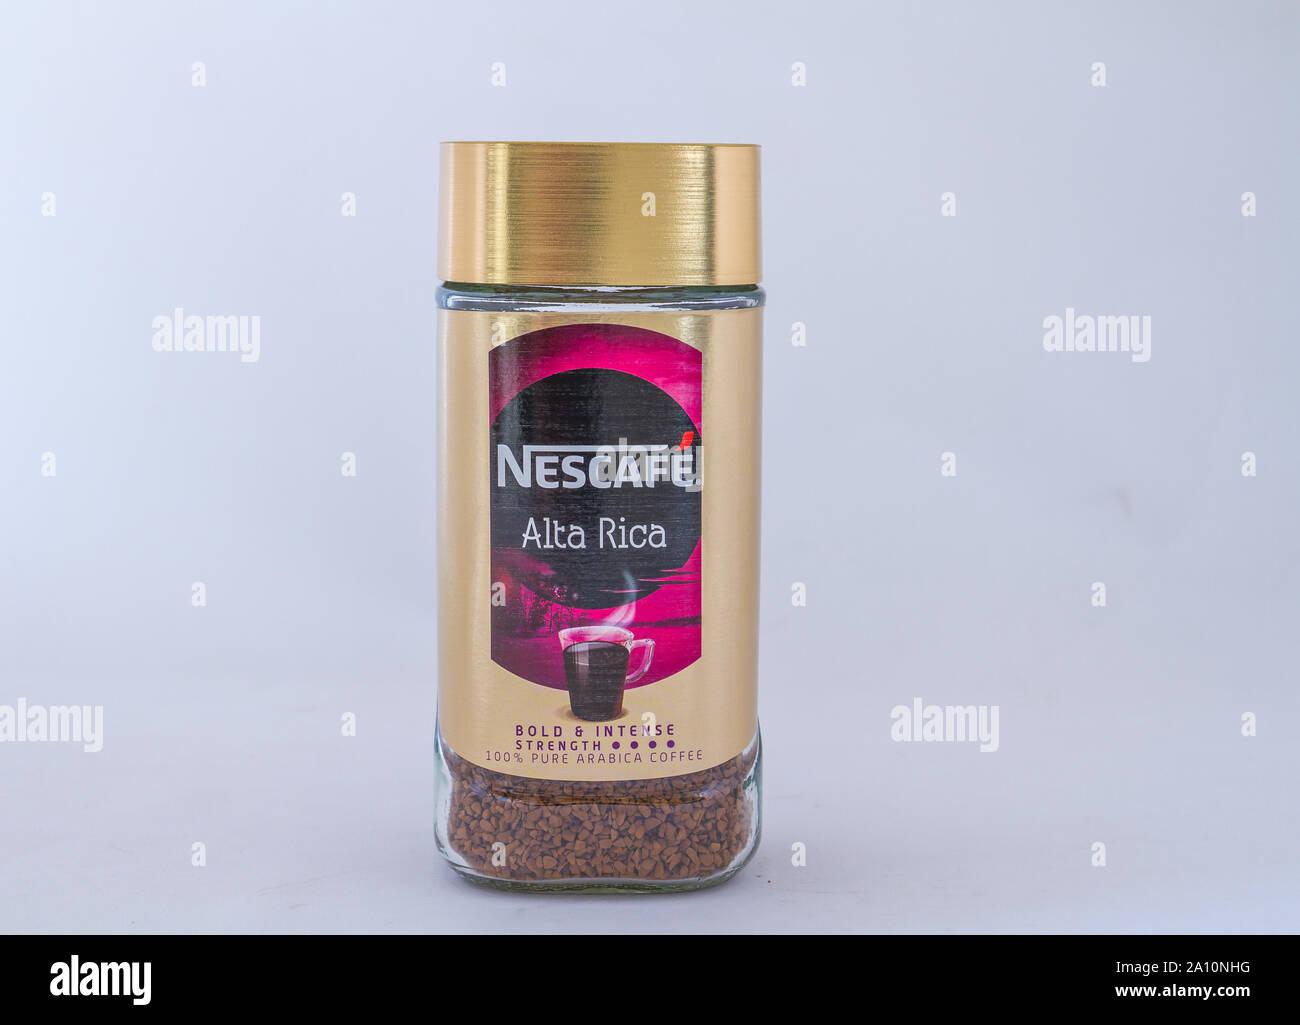 Nescafe Instant Coffee Stock Photos Nescafe Instant Coffee